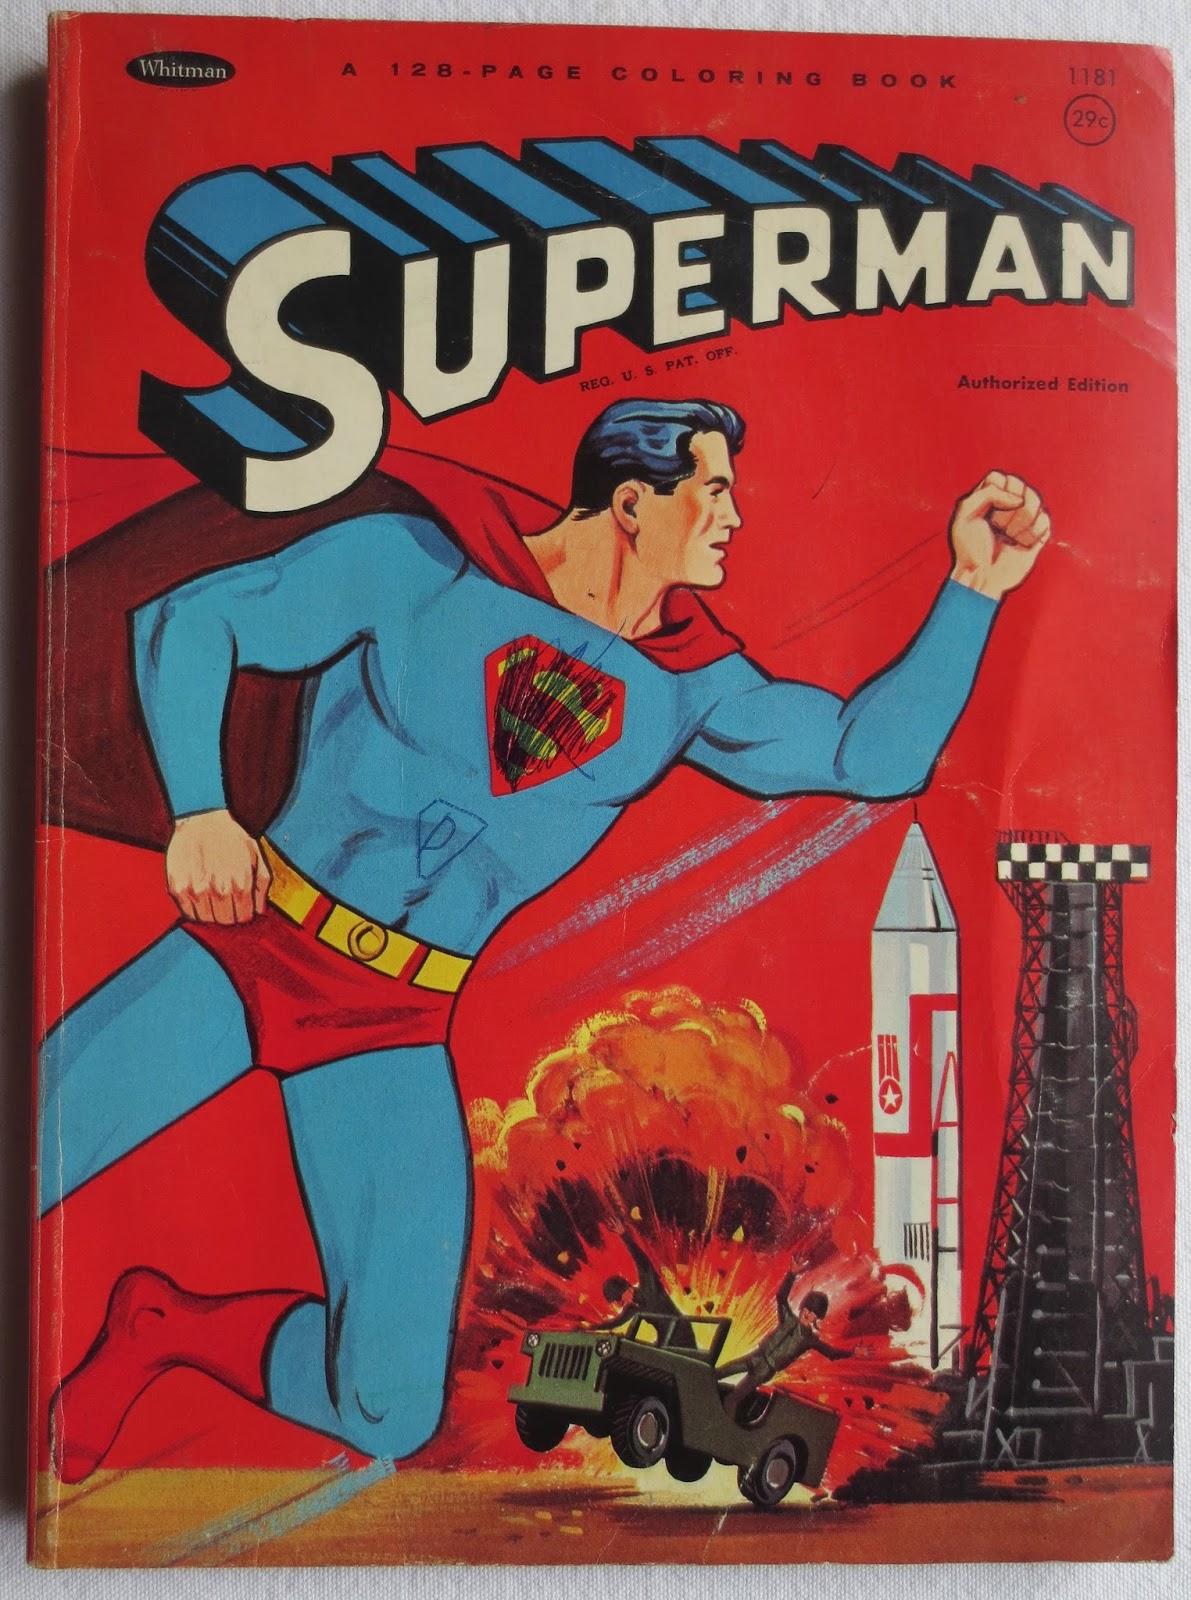 Superman Batman Coloring Books 1965